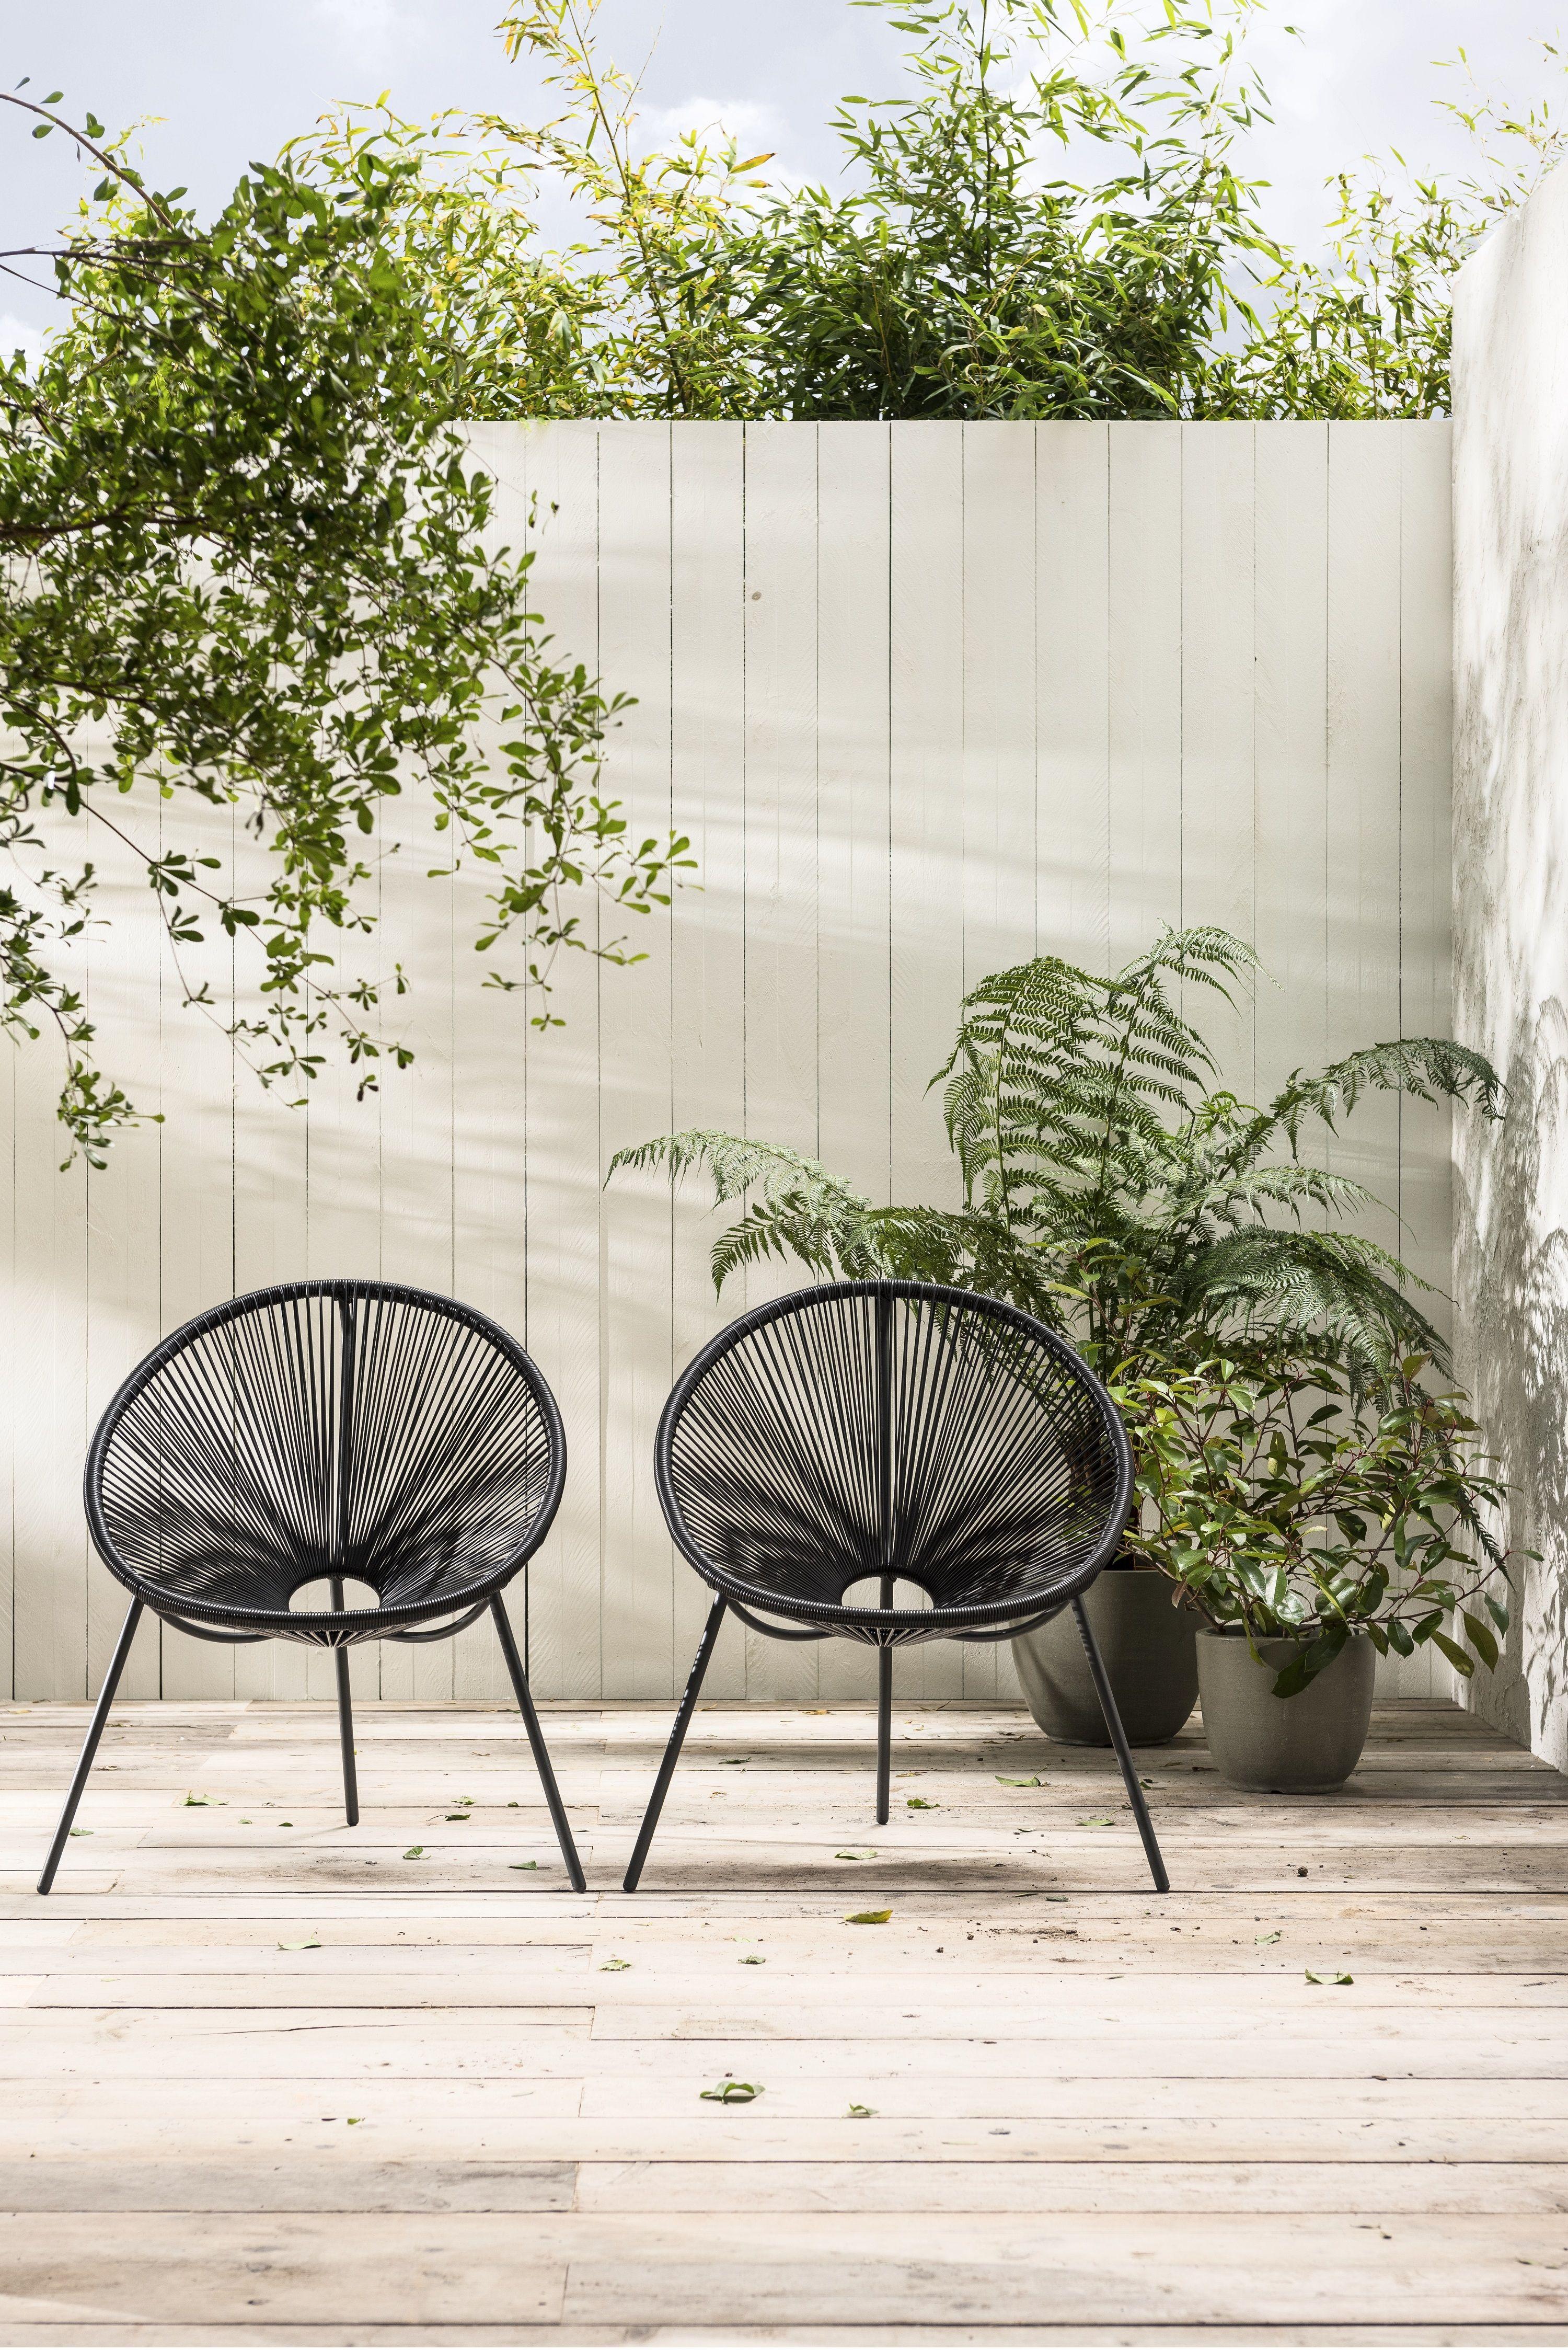 Tuintrend urban hangout en 2018 karwei urban hangout for Zwarte tuinstoelen